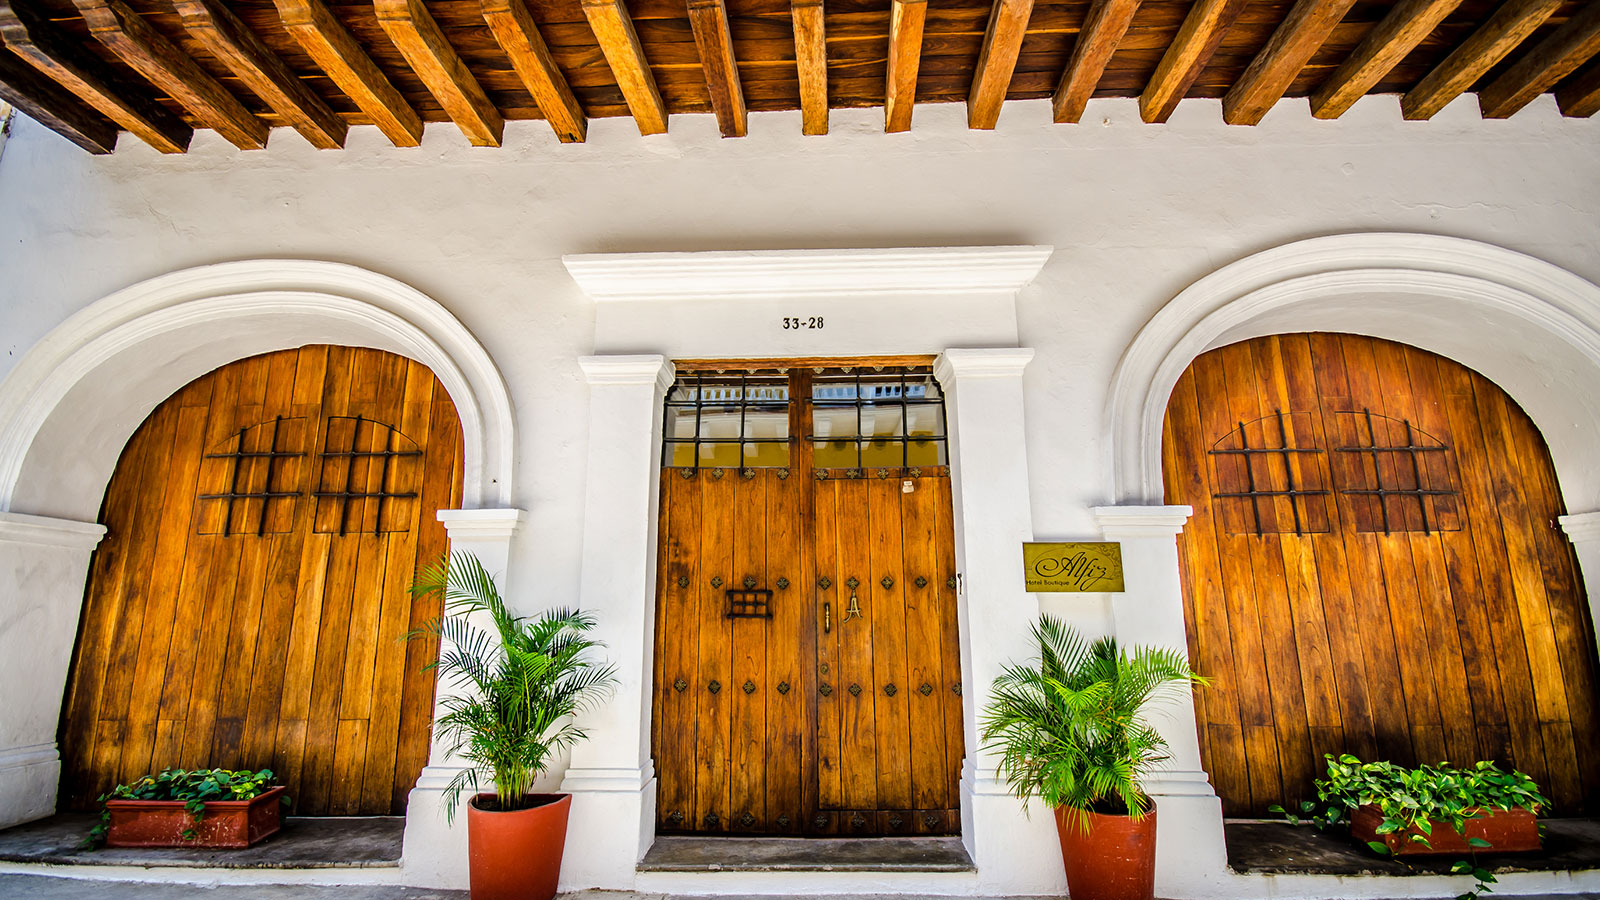 Image of gardn patio restaurant at Alfiz Hotel, 1700, Member of Historic Hotels Worldwide, in Cartagena de Indias, Colombia, Explore